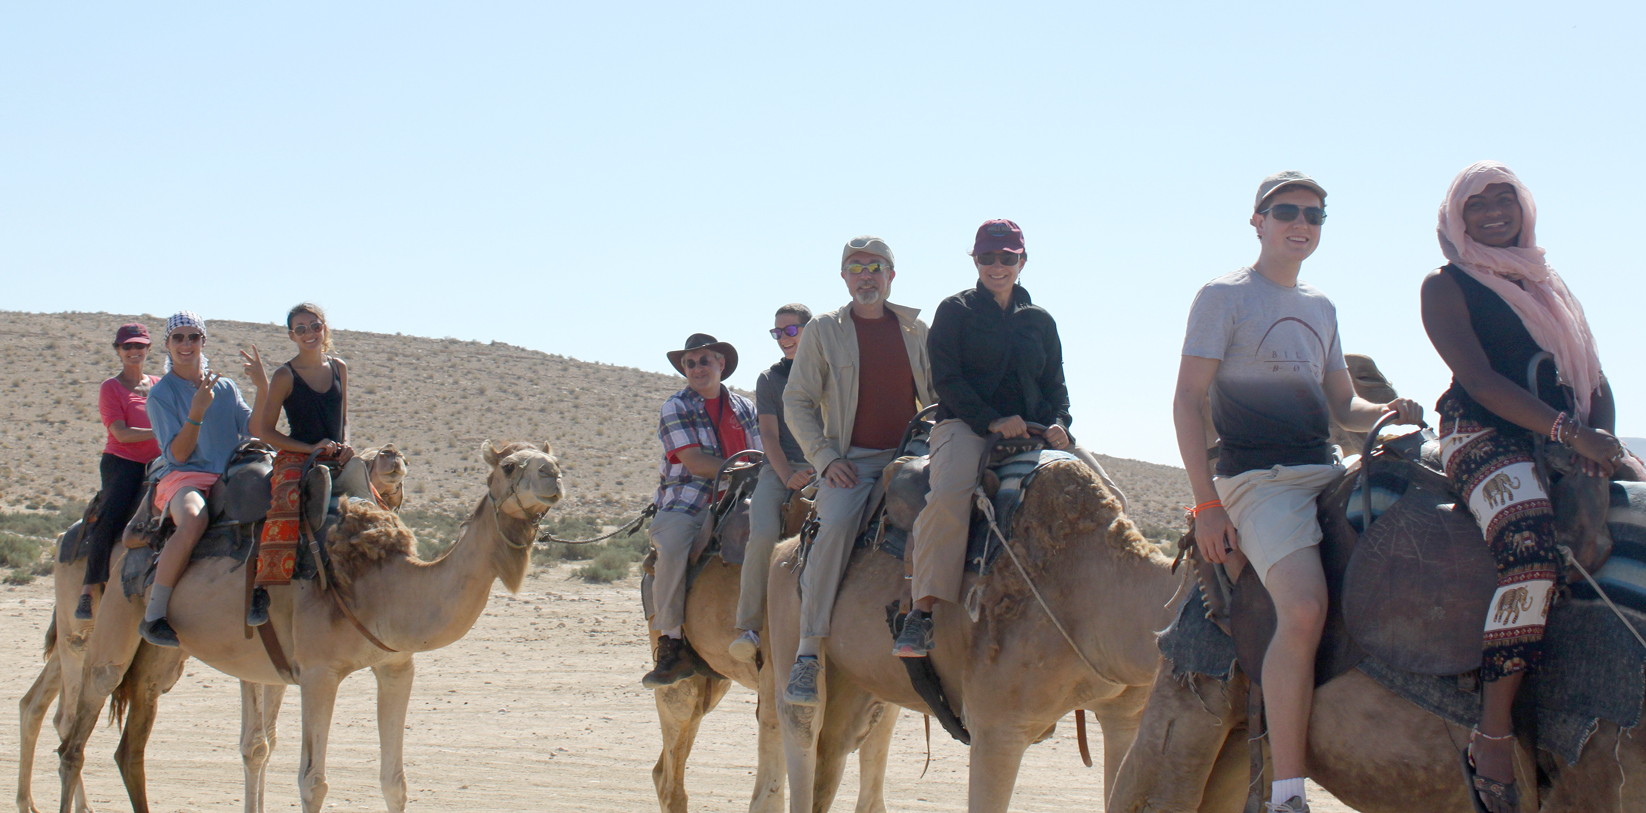 camel-group.jpg